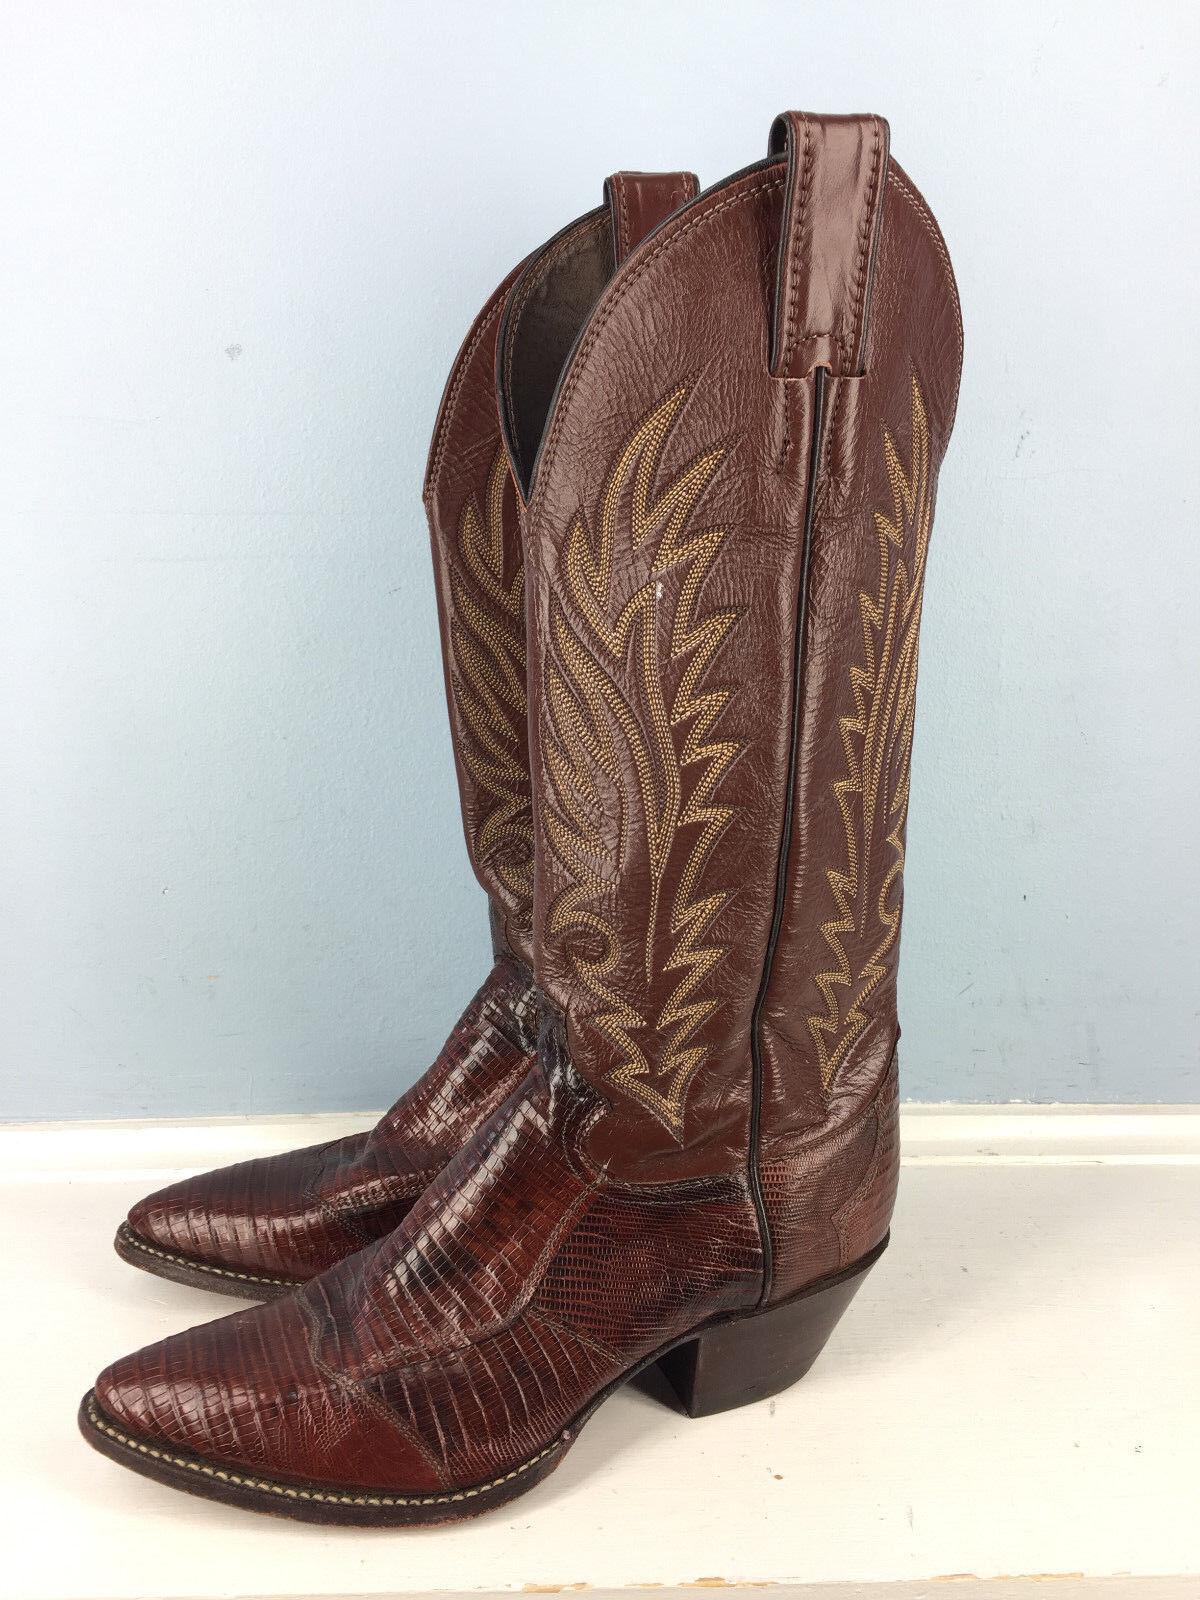 JUSTIN Brown Pelle stitched Cowboy Boot 7 D Reptile Pelle Excellent